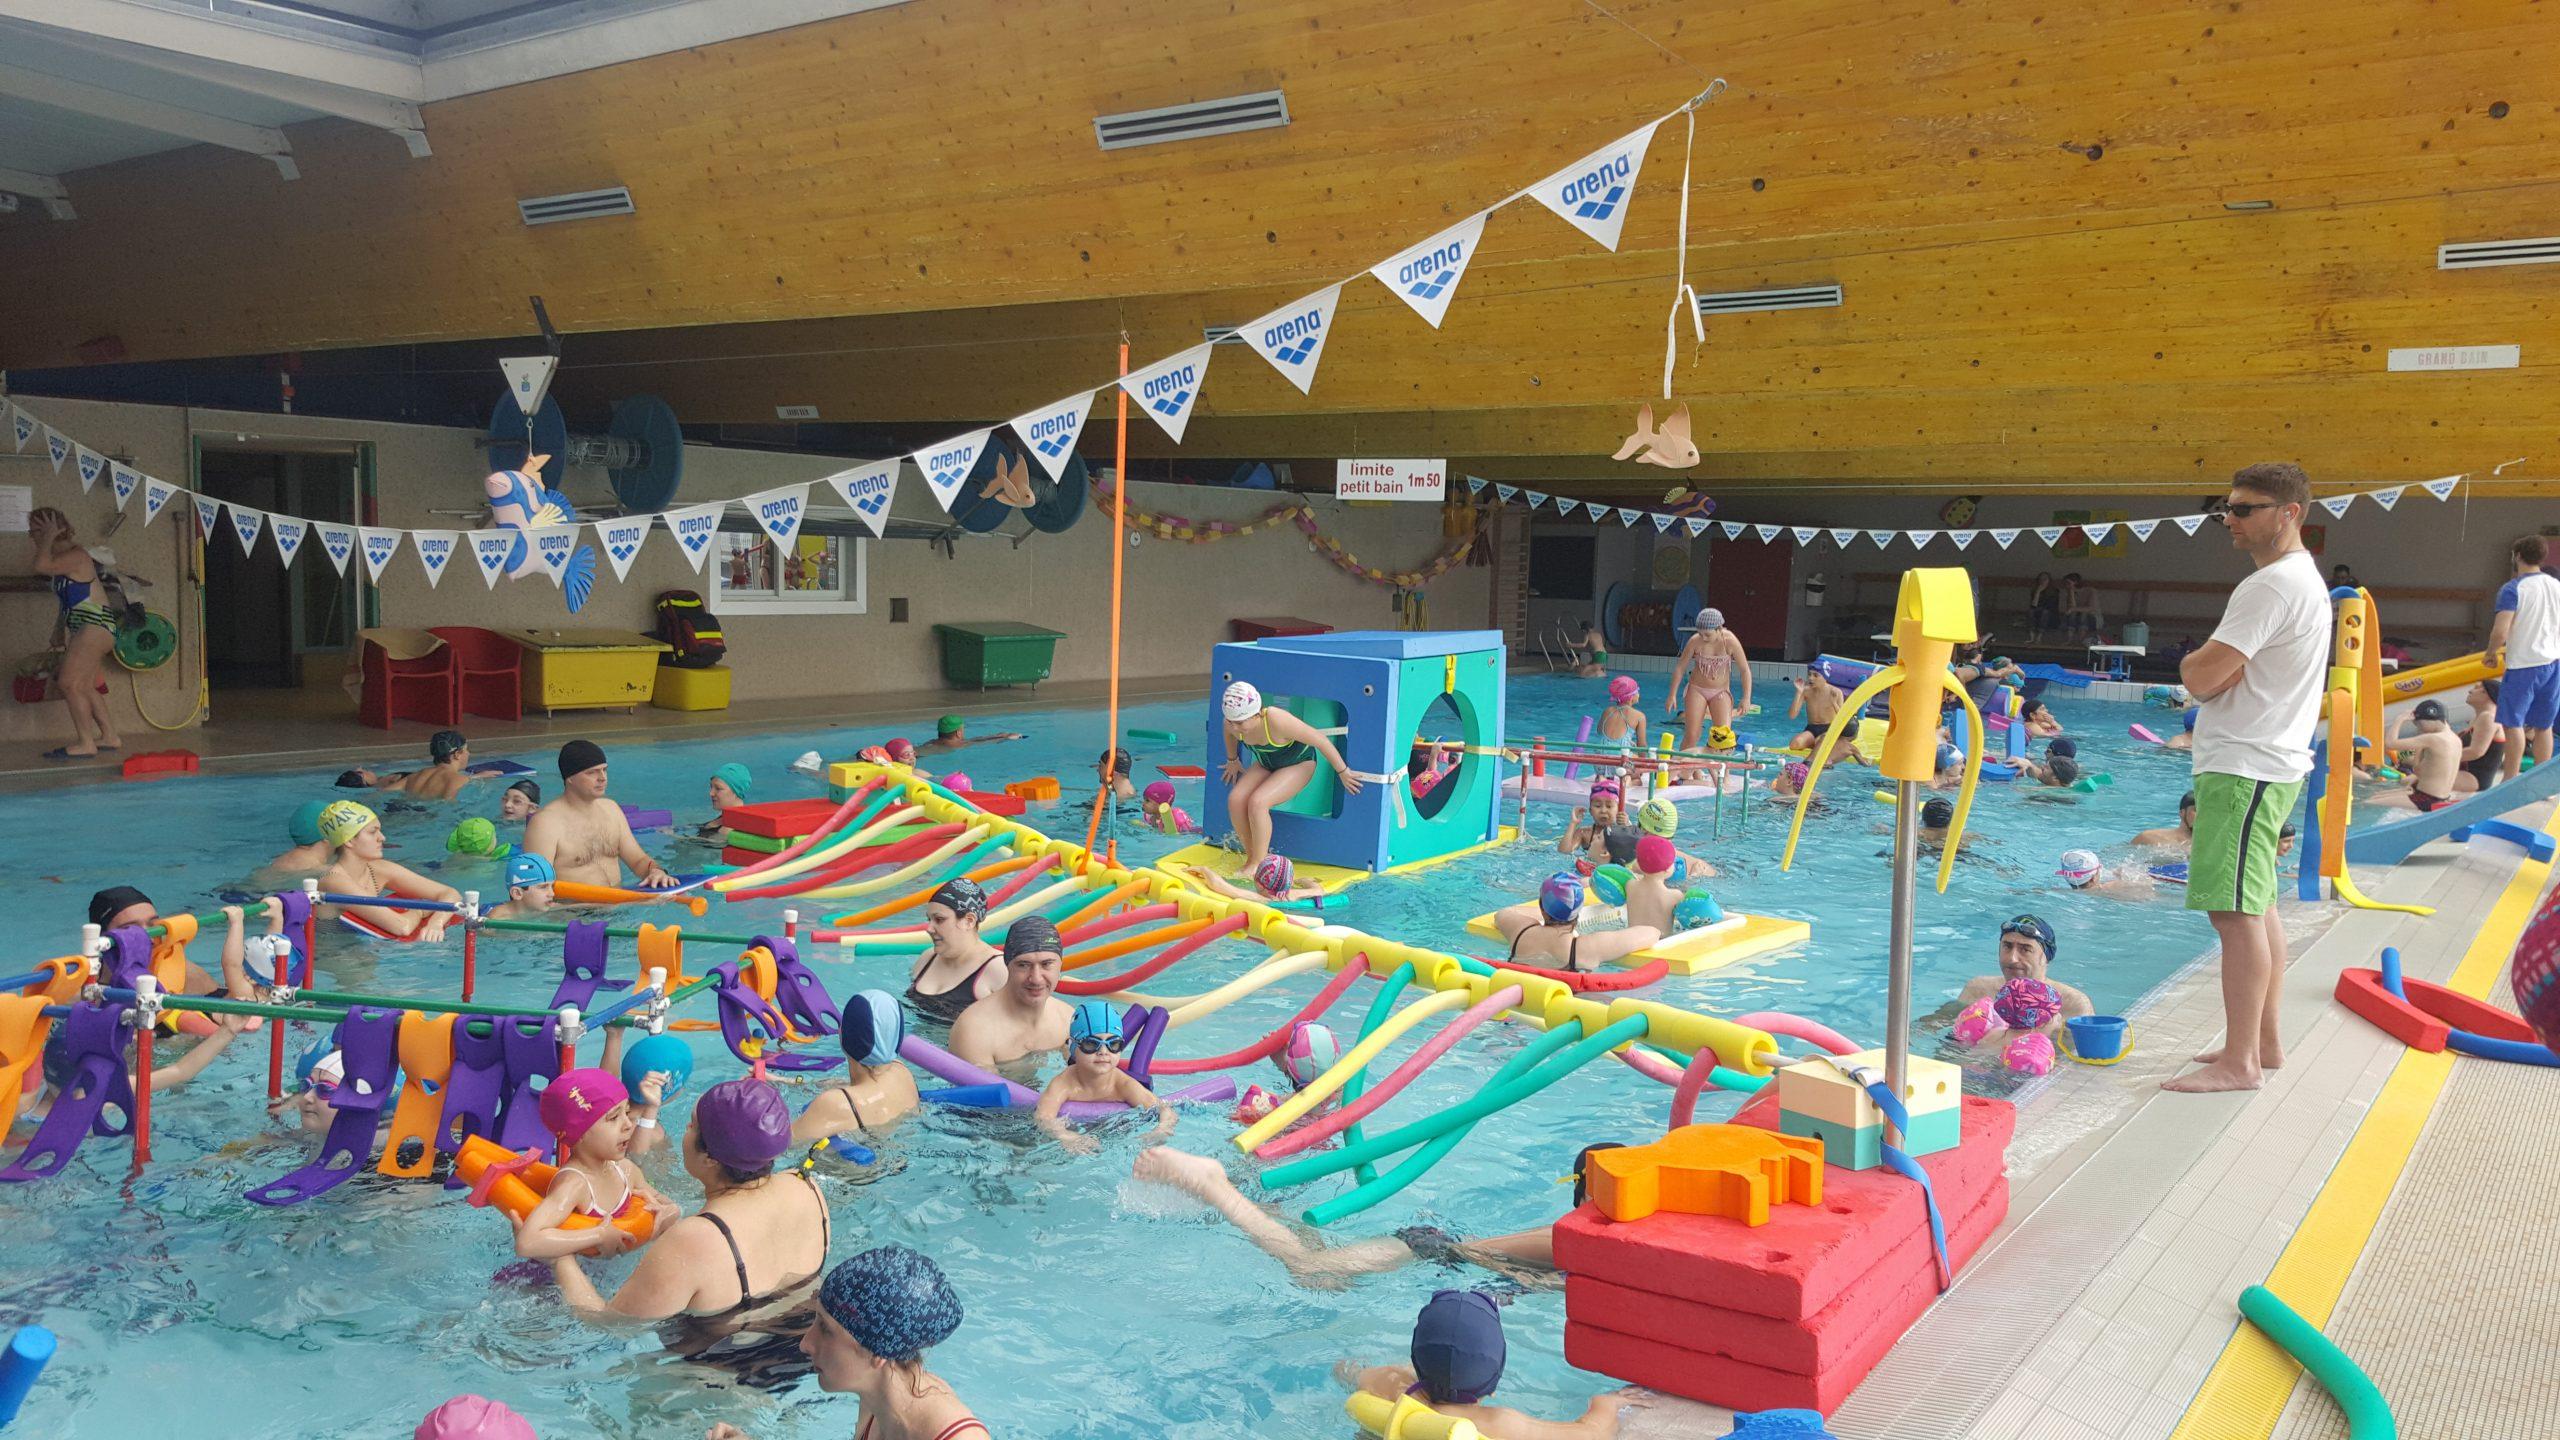 Piscine De Cusset - Stade Aquatique dedans Piscine Chamalières Horaires